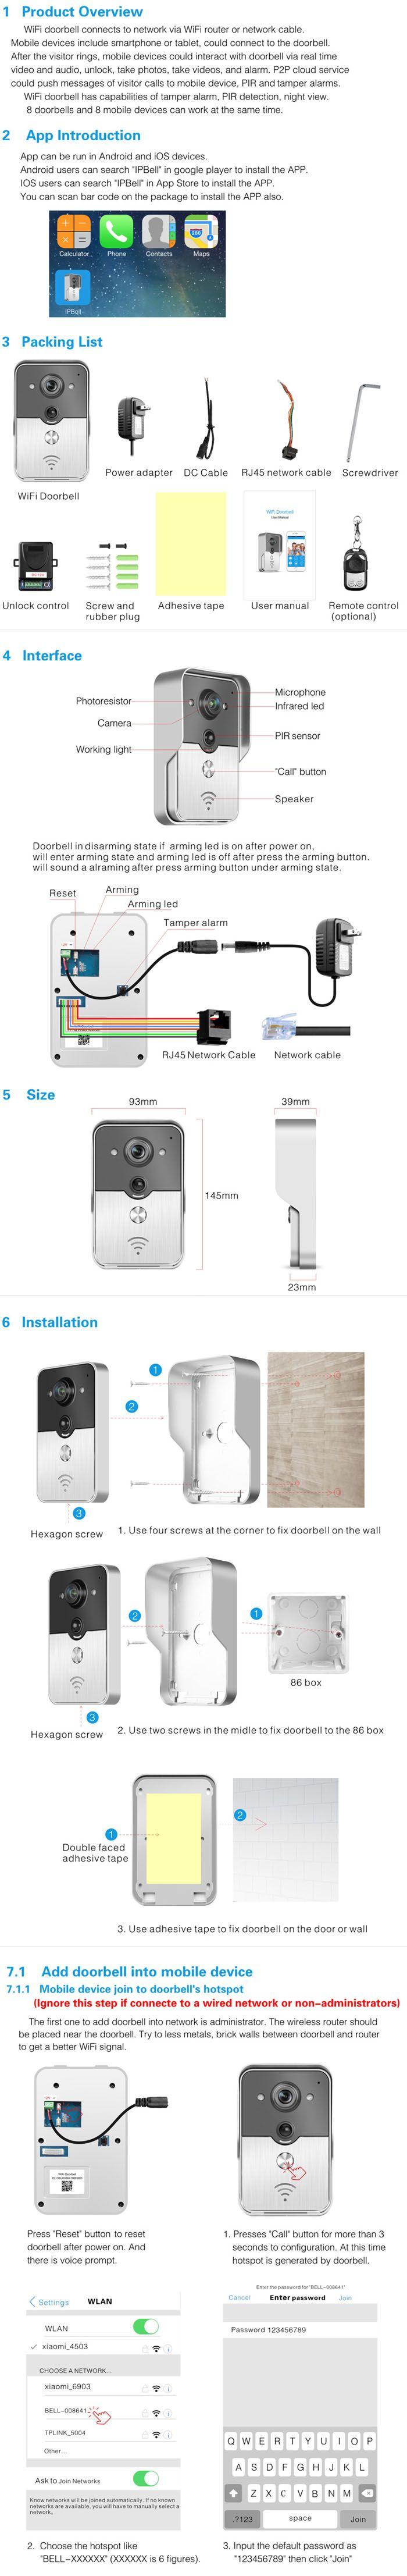 (1 set) WIFI wireless Video door phone Night version MINI camera Video Intercom support IOS&Andorid APPS Control Smart Home , https://myalphastore.com/products/1-set-wifi-wireless-video-door-phone-night-version-mini-camera-video-intercom-support-iosandorid-apps-control-smart-home/,